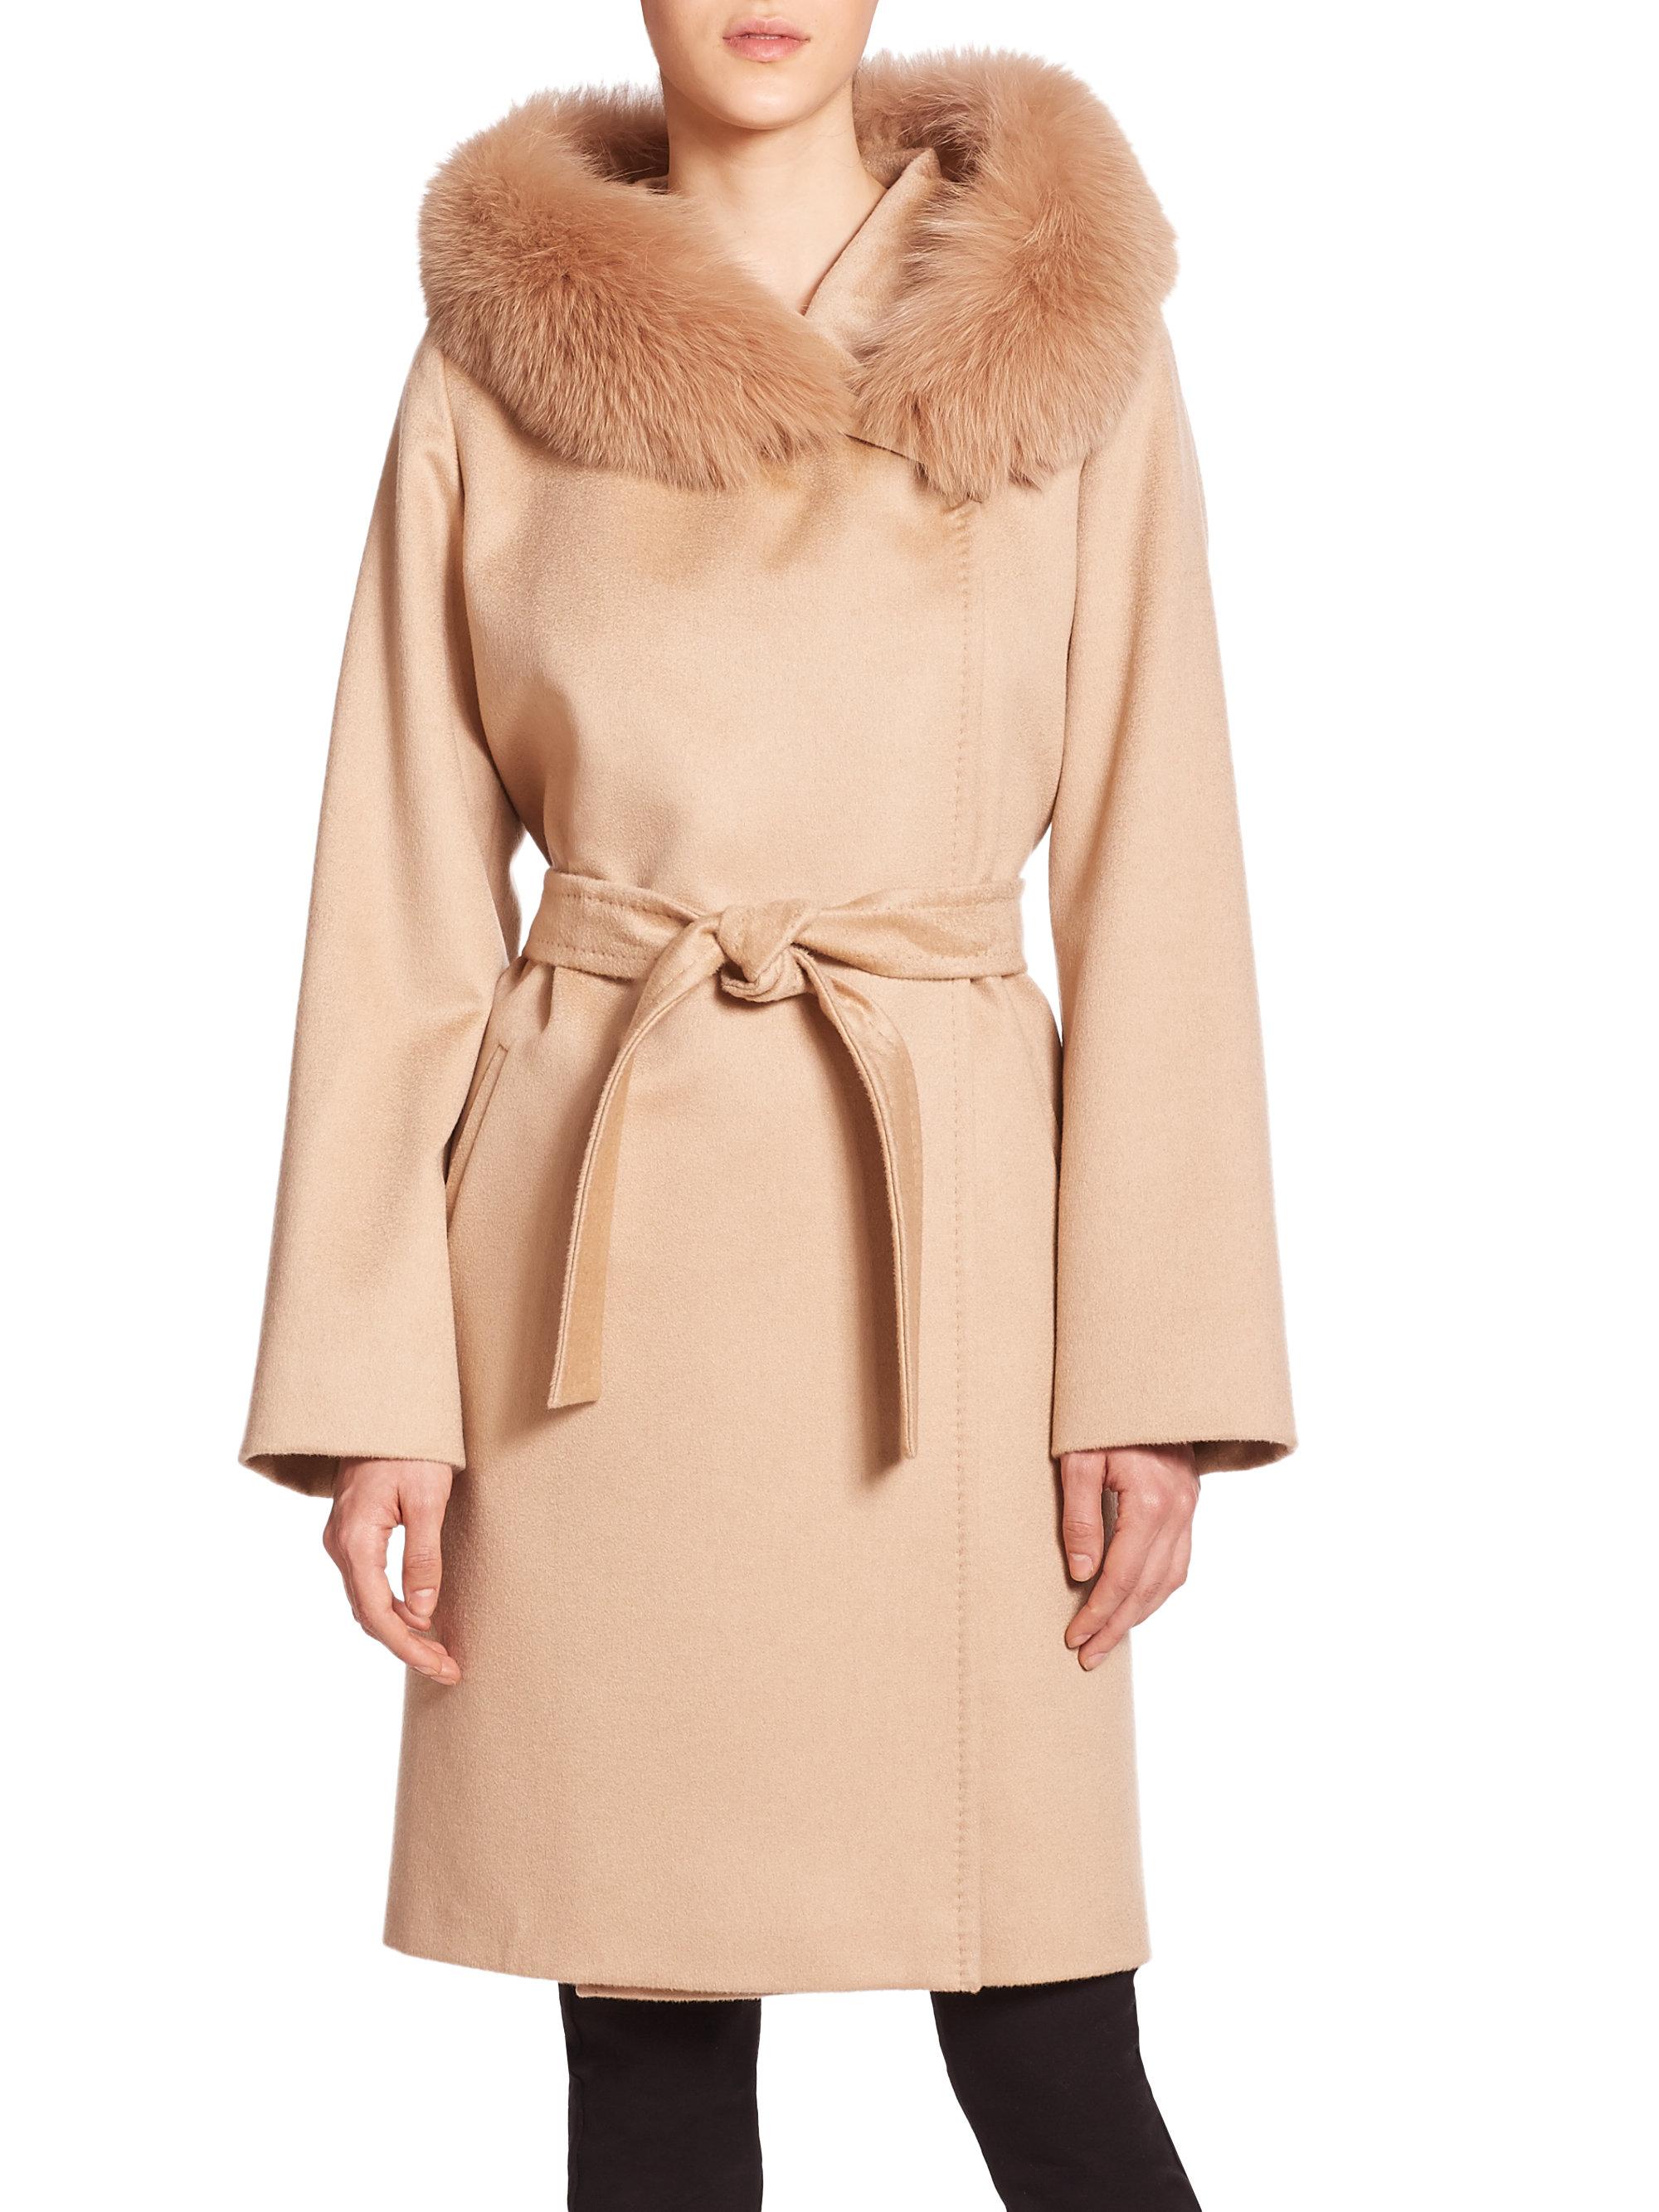 Max mara studio Lallo Fur-trimmed Cashmere Coat in Natural | Lyst